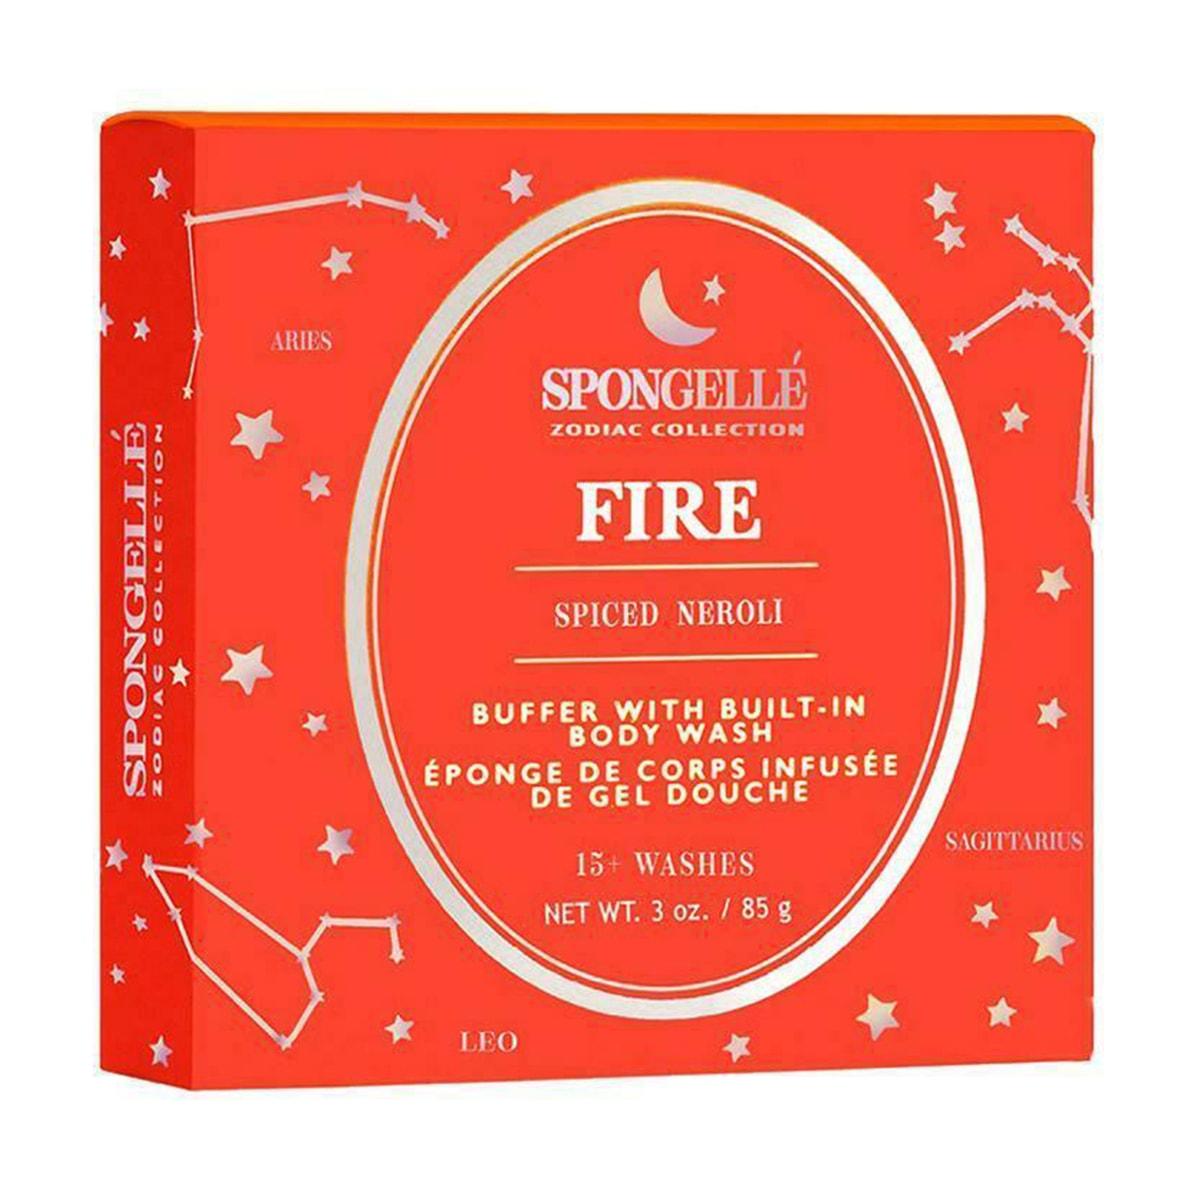 Yamibuy.com:Customer reviews:Zodiac Collection Fire Spiced Neroli 85g